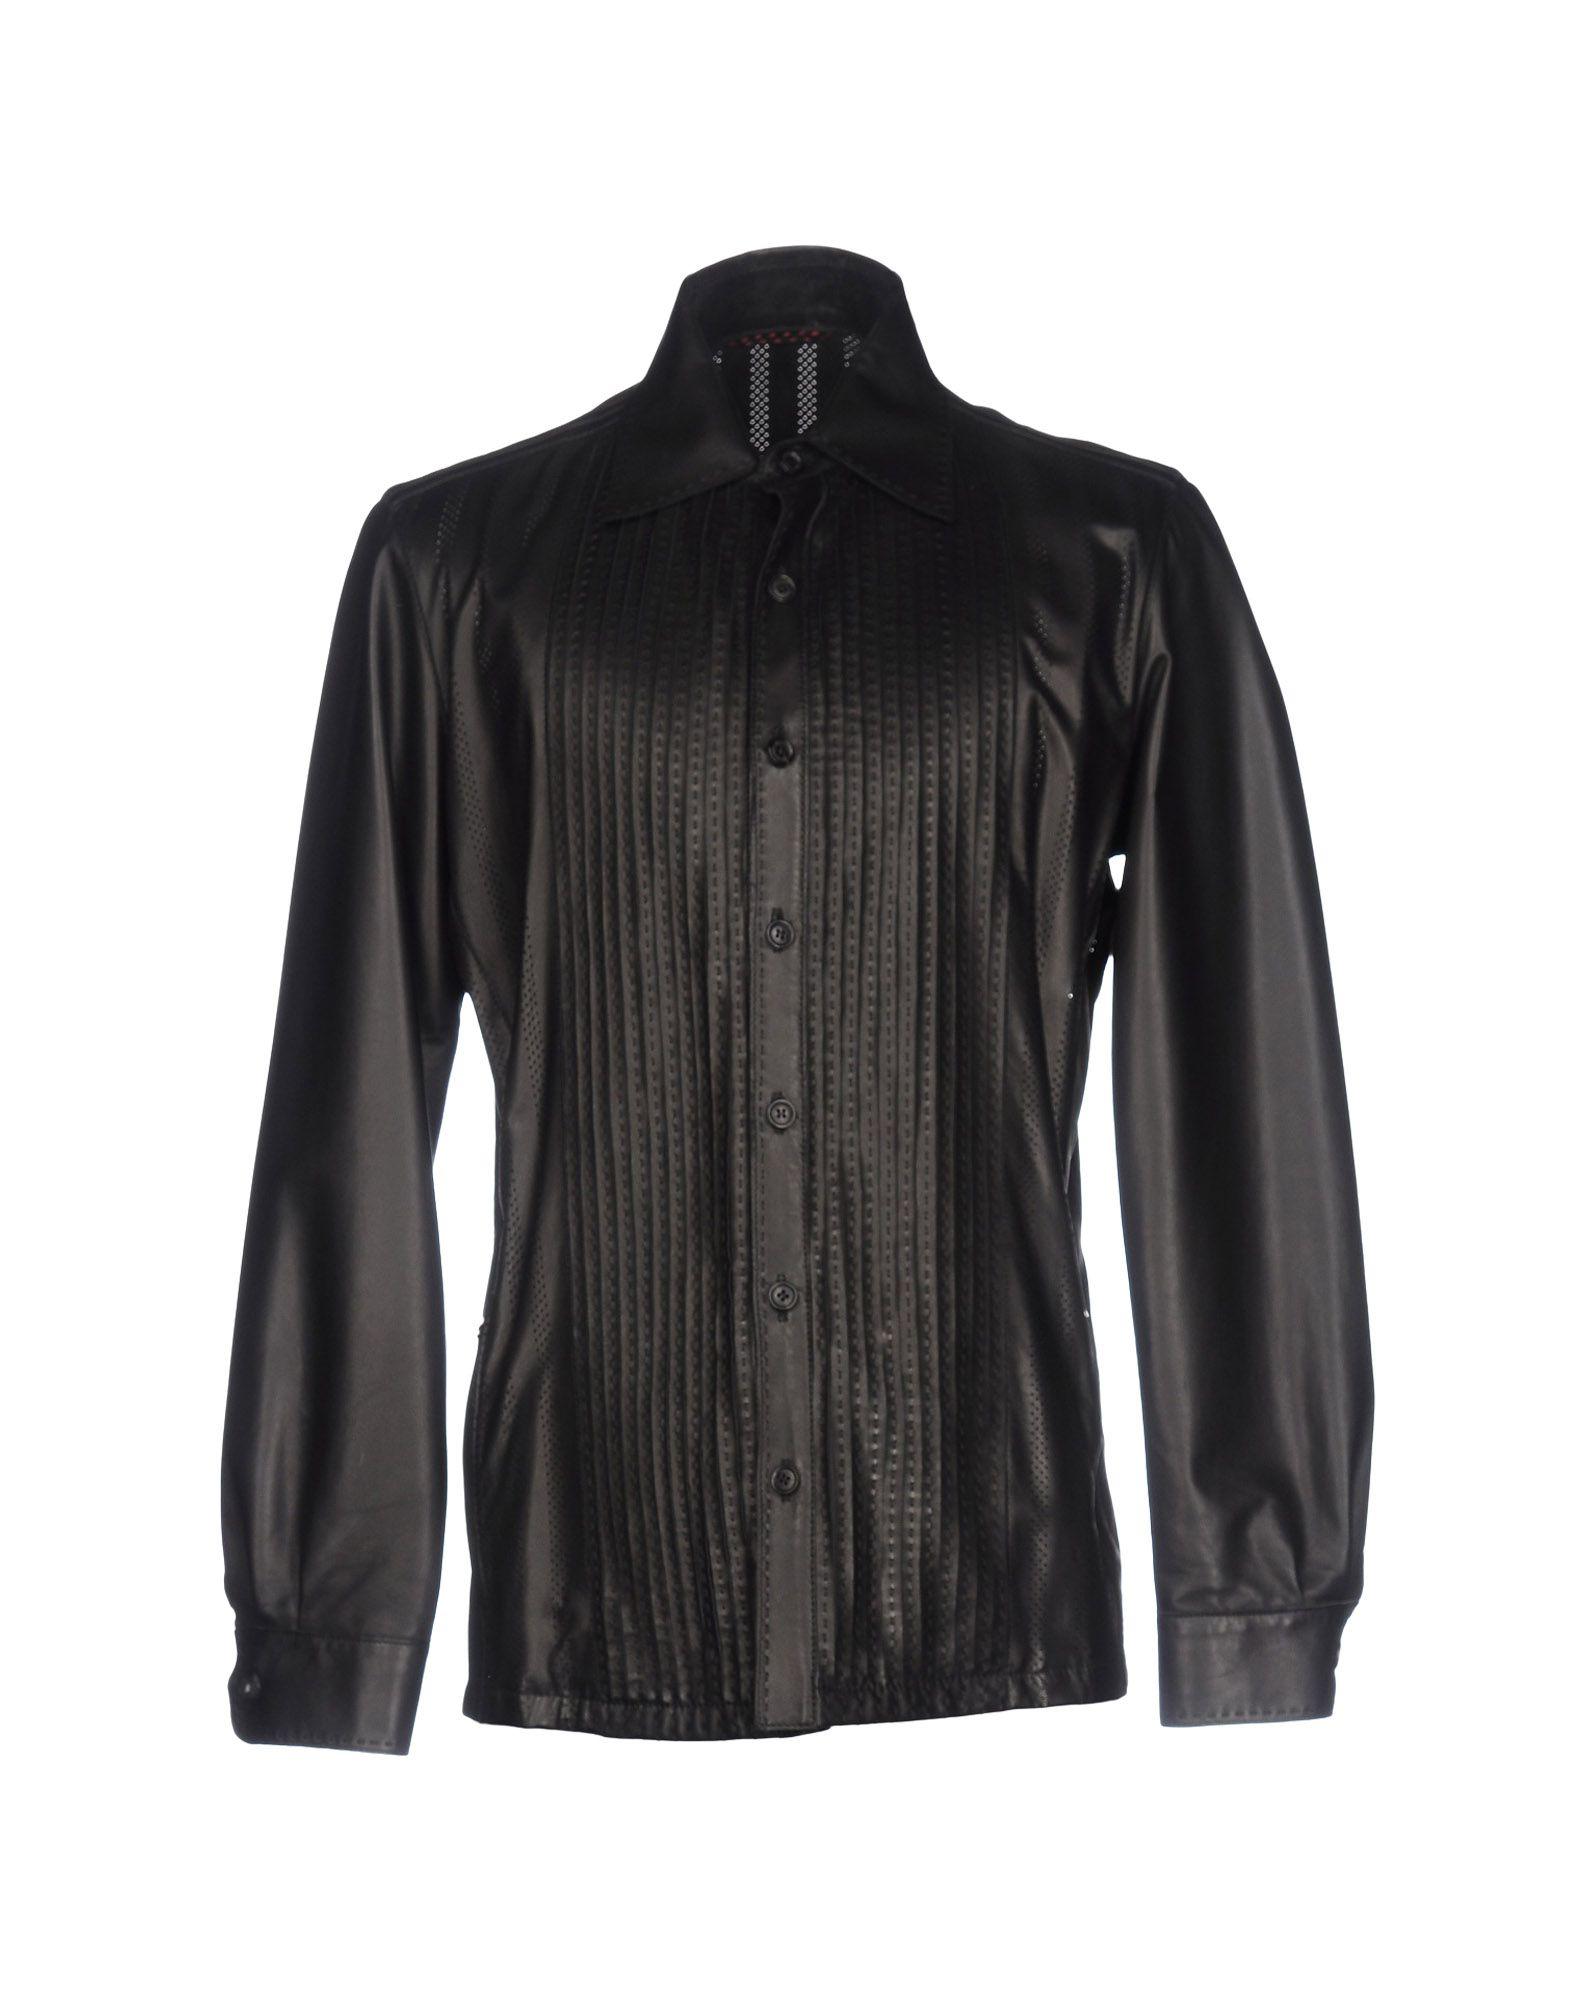 KAPRAUN Herren Hemd Farbe Schwarz Größe 5